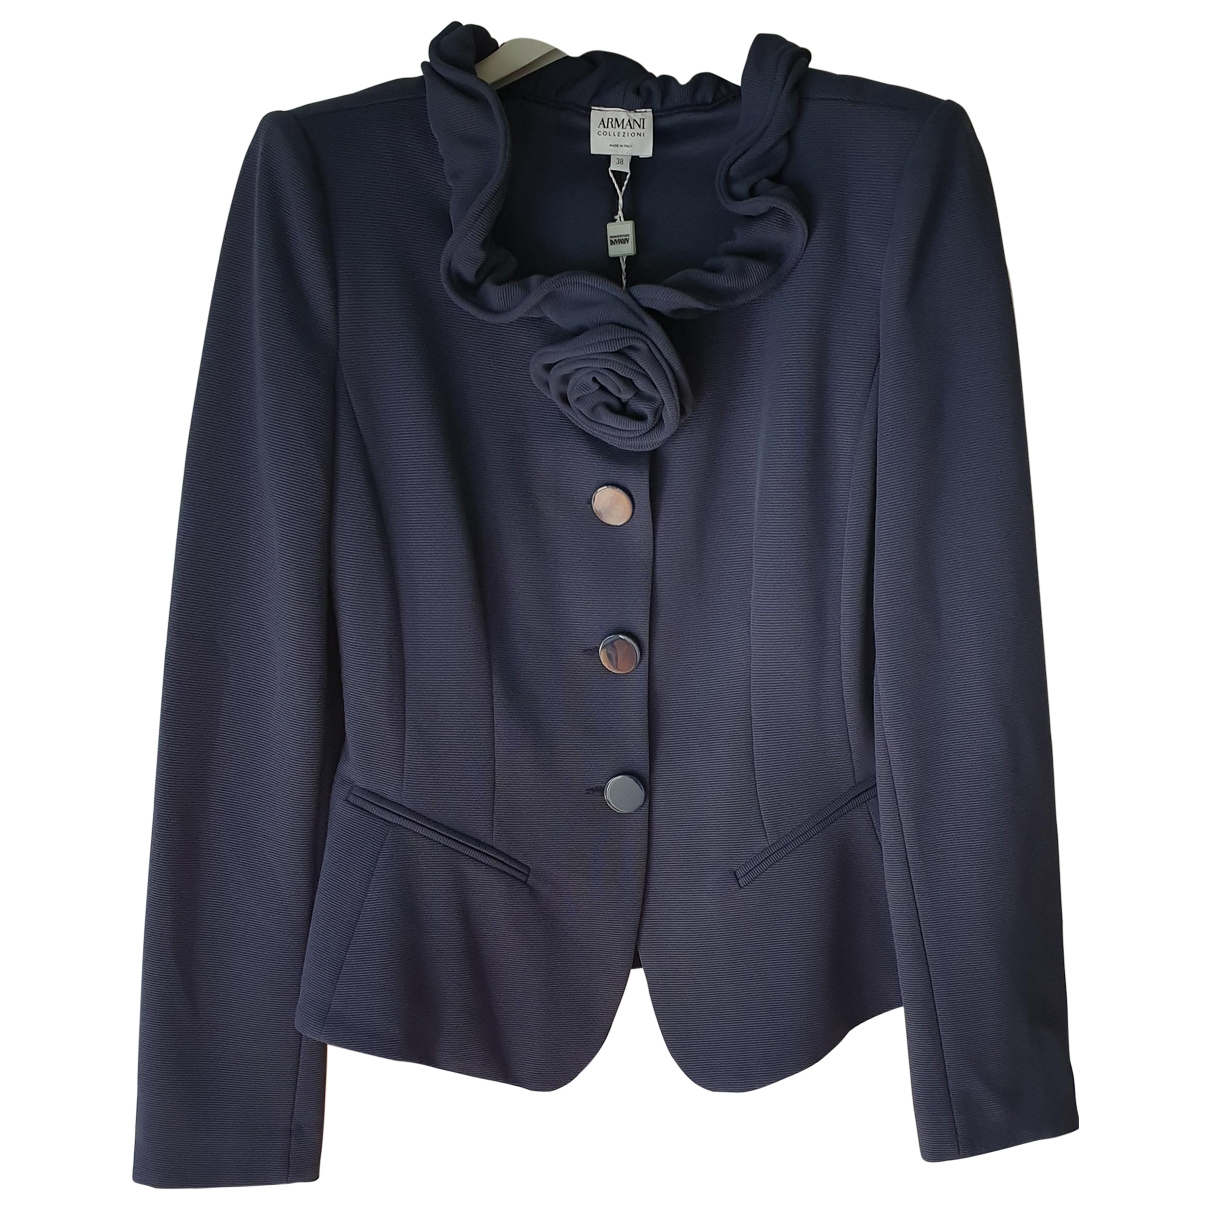 Armani Collezioni \N Navy jacket for Women 38 IT